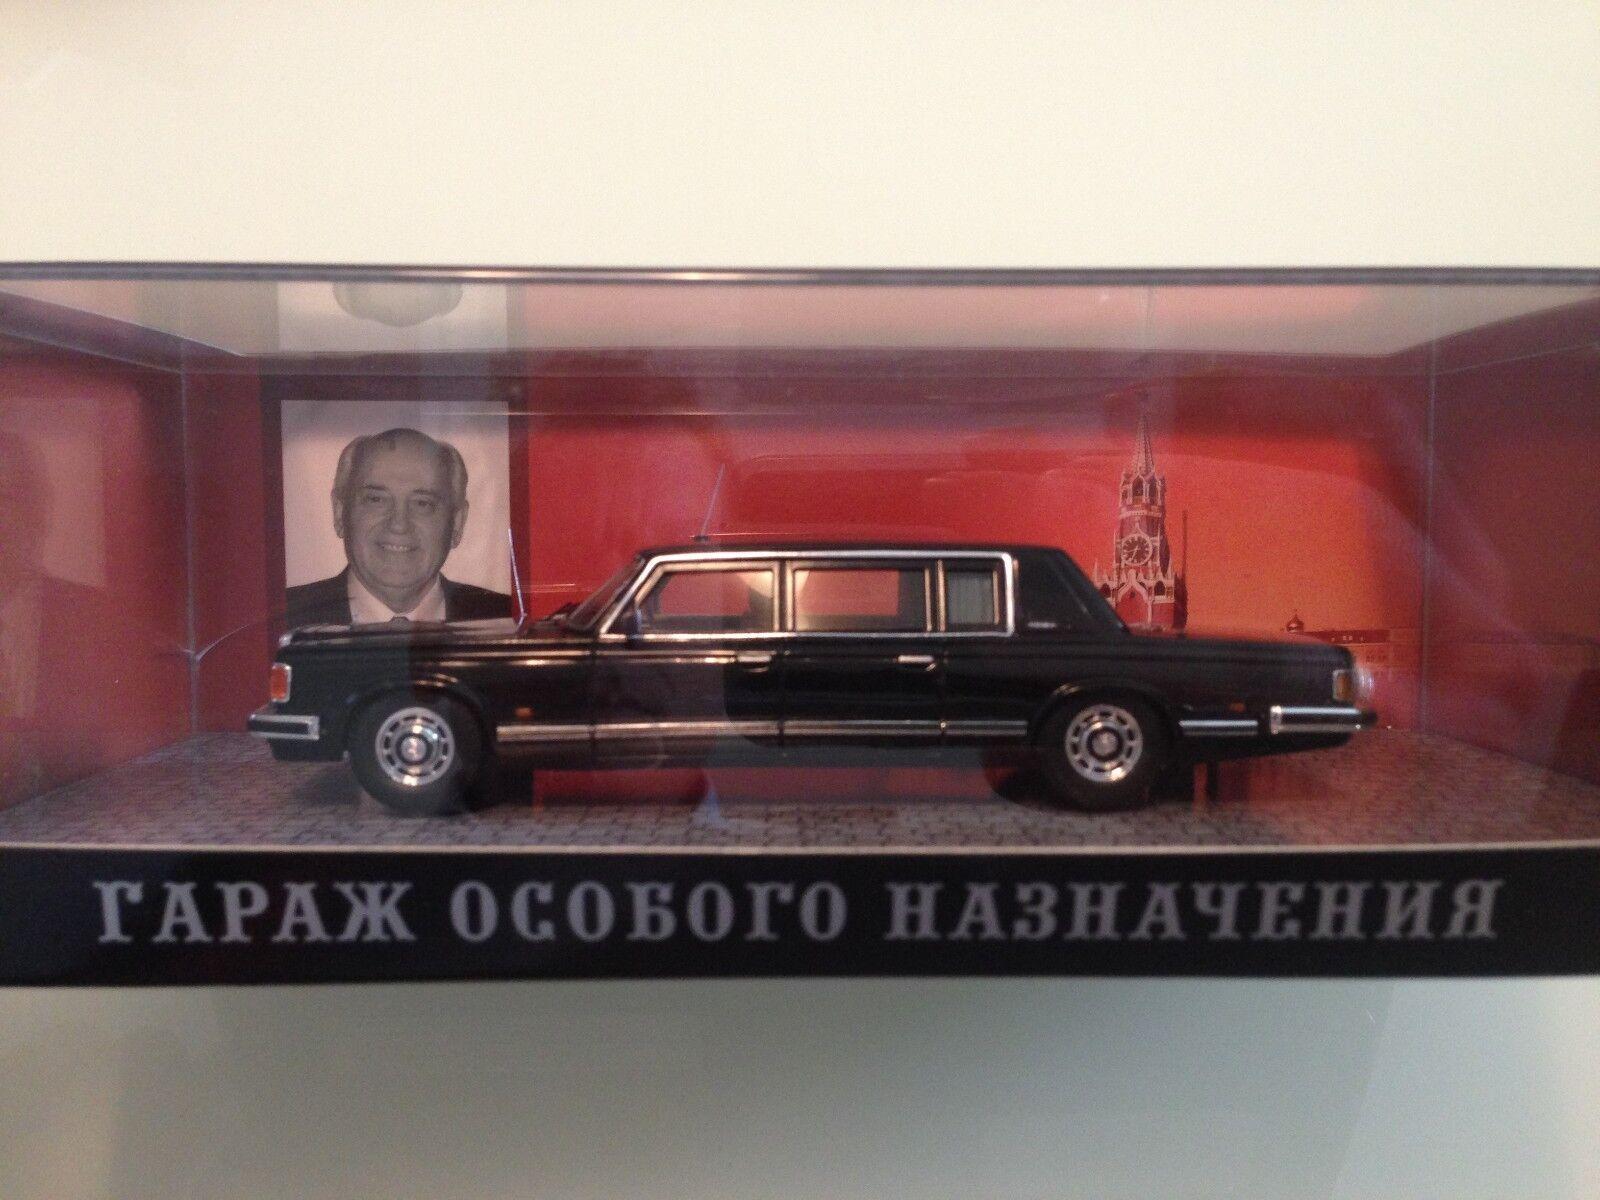 Zil41052 Limousine blindati Gorbaciov USSR 1986 DIP Models gon052 1:43 OVP